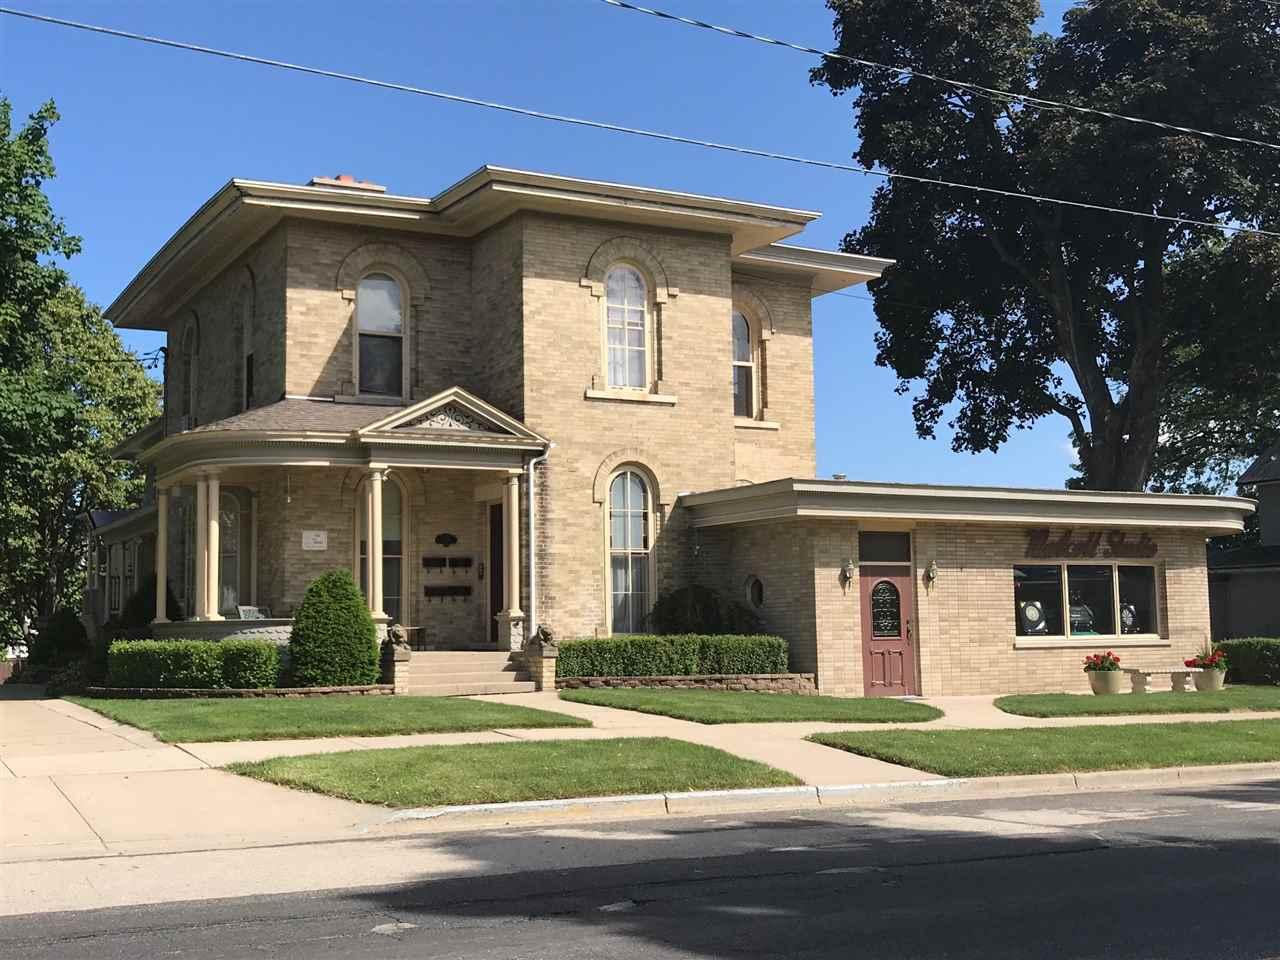 229 Ludington Apt 1 N, Columbus, Wisconsin 53925-0000, 1 Bedroom Bedrooms, ,Rental,For Rent,Ludington Apt 1,1894815